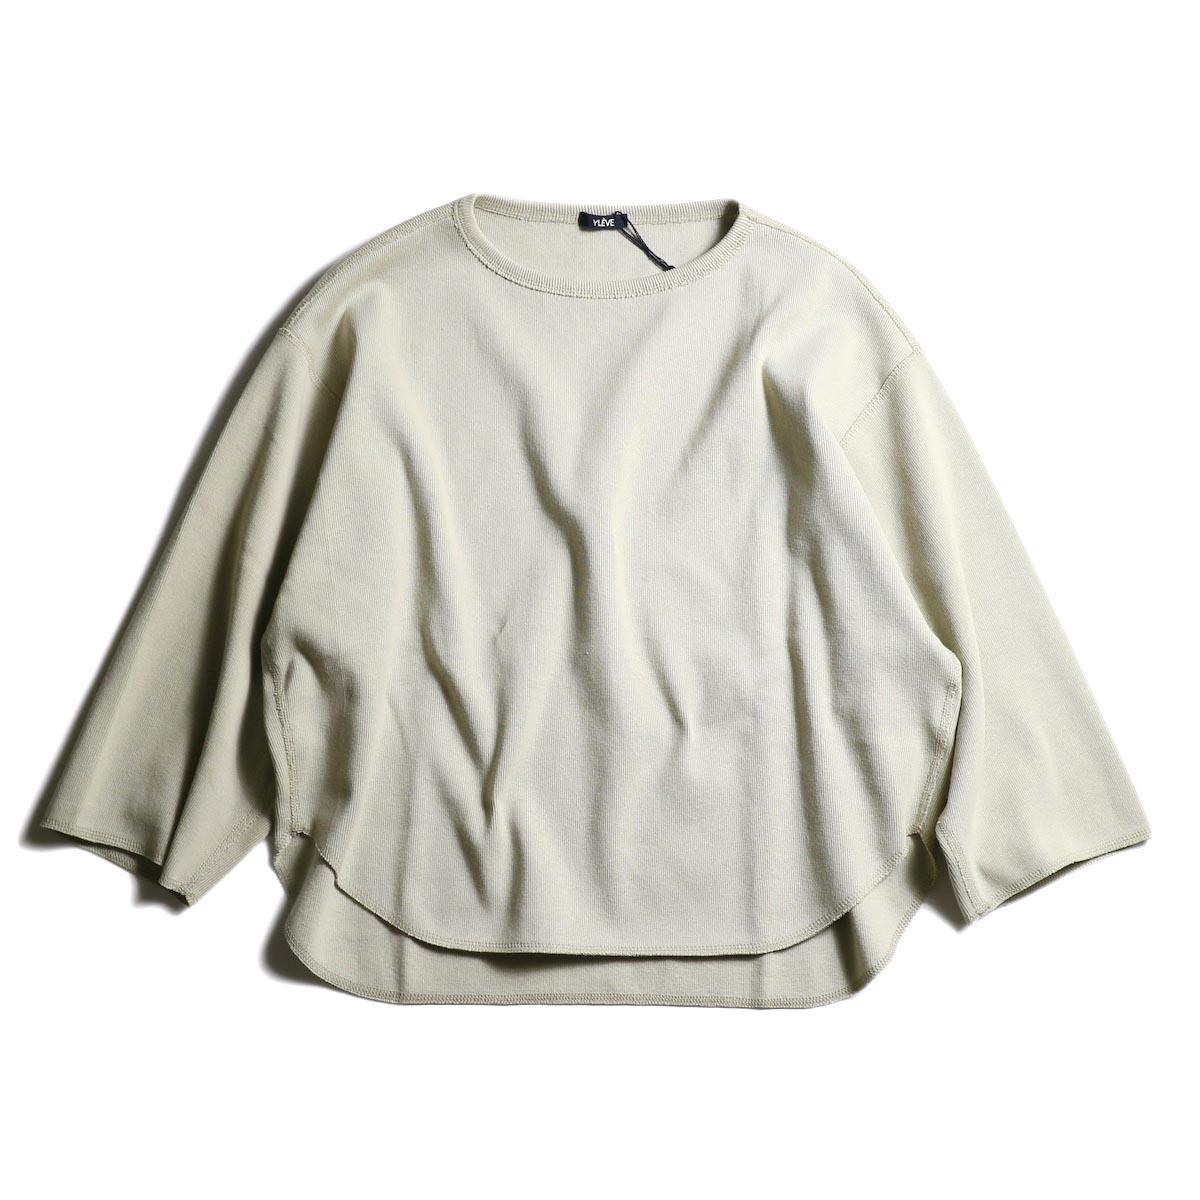 YLEVE / Cotton Rib Pullover (Safali)